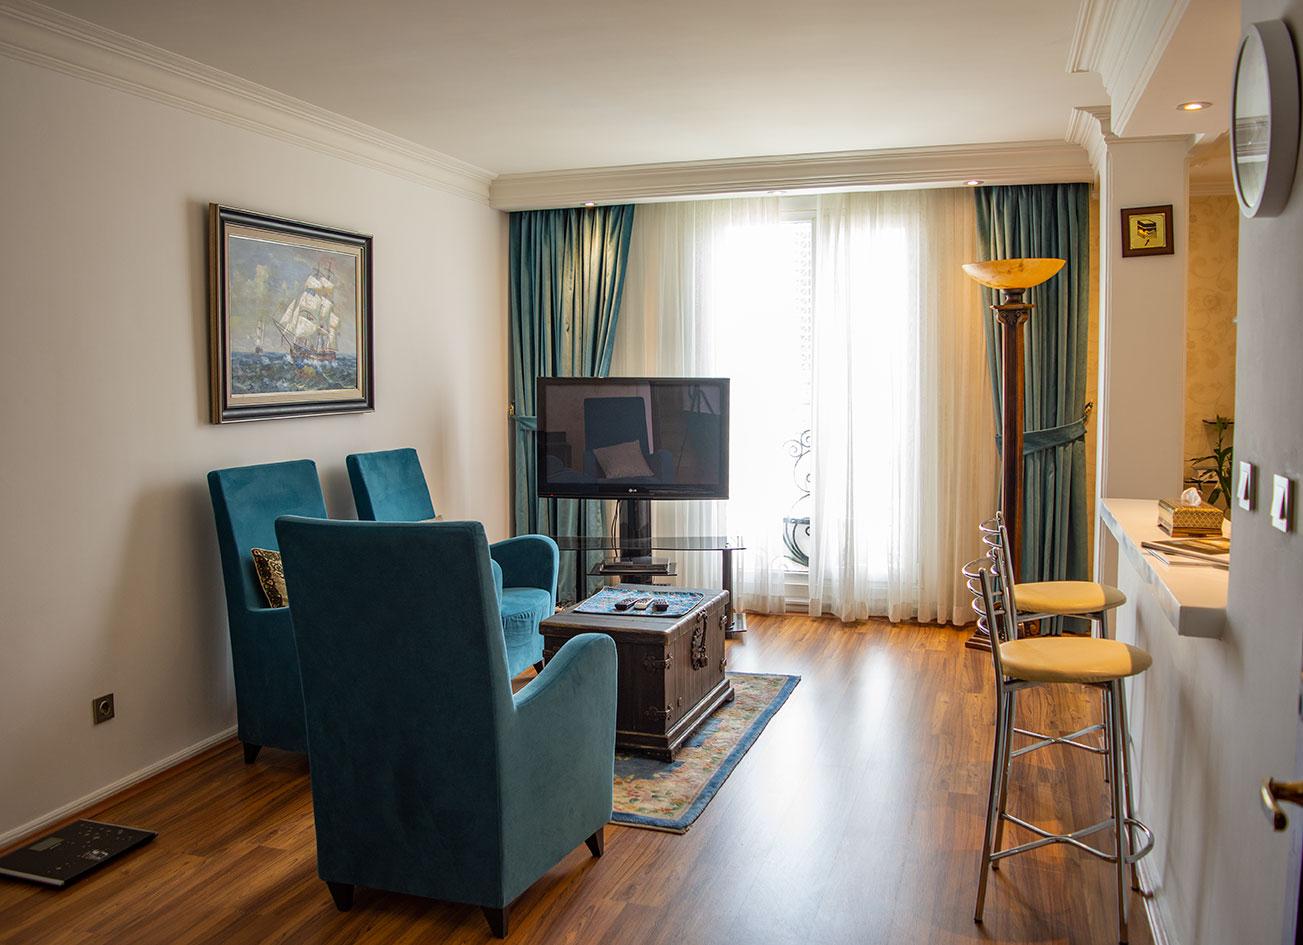 TajMahal-Hotel-One-Bedroom-Apartment